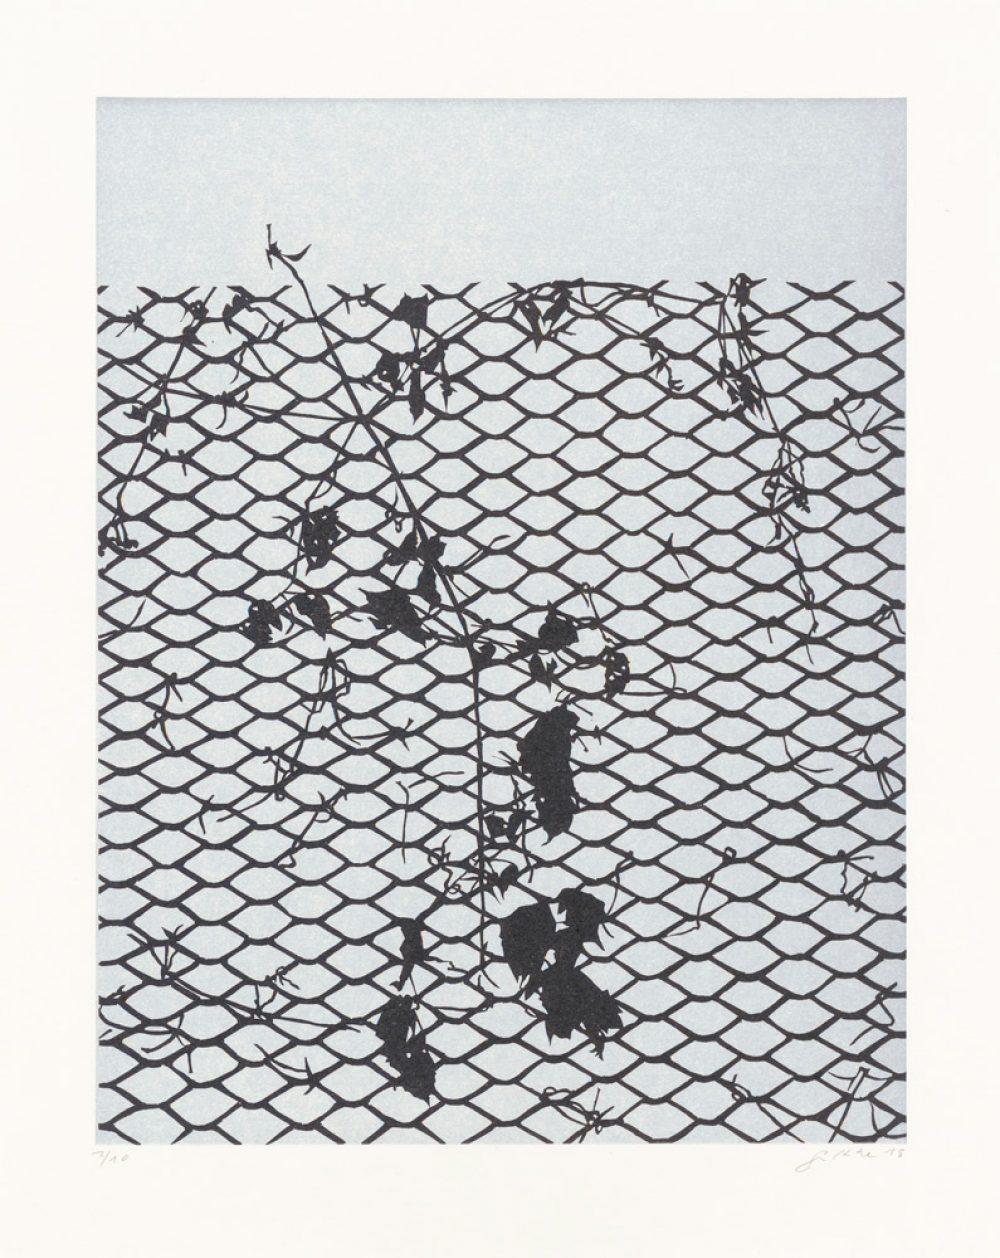 Beyond (2018), 26 x 20 cm, linocut on paper